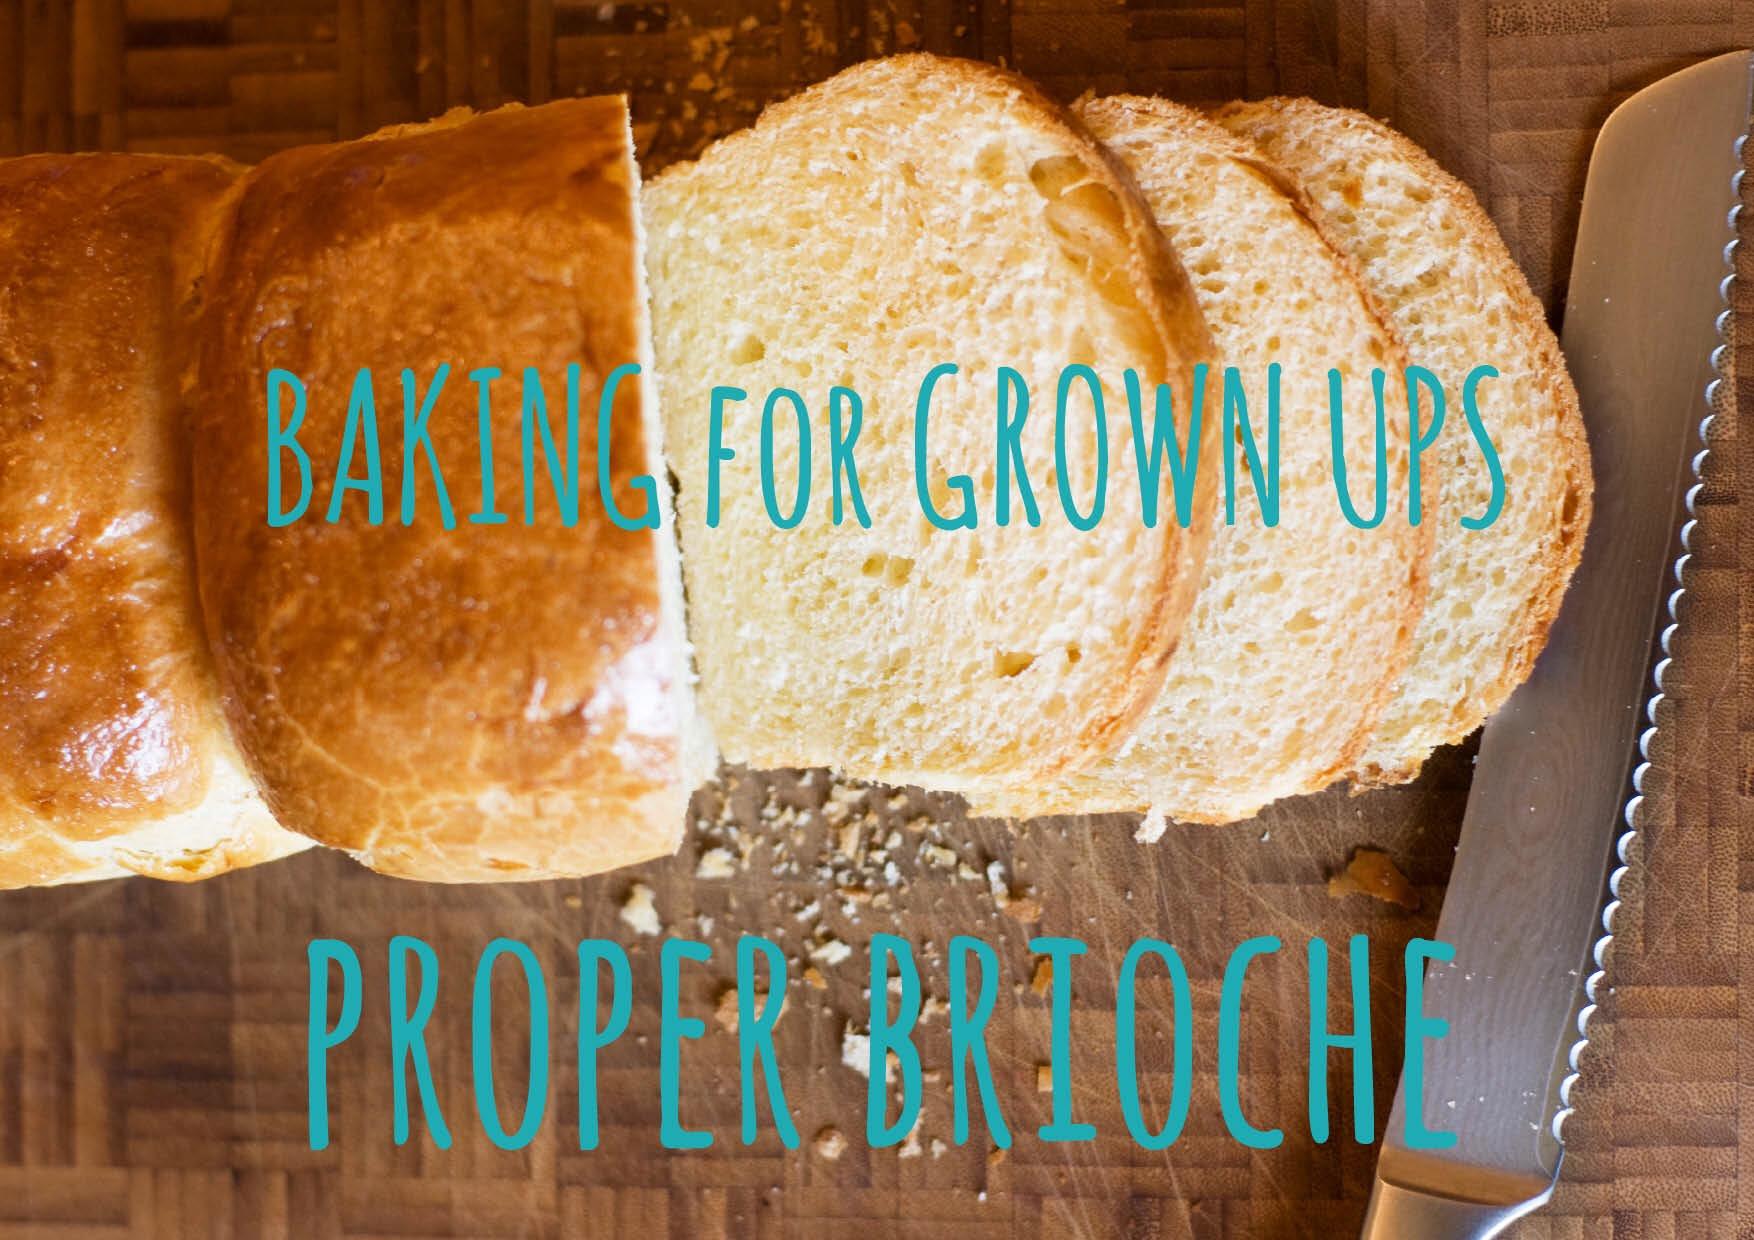 Brioche title photo - Baking for grown ups